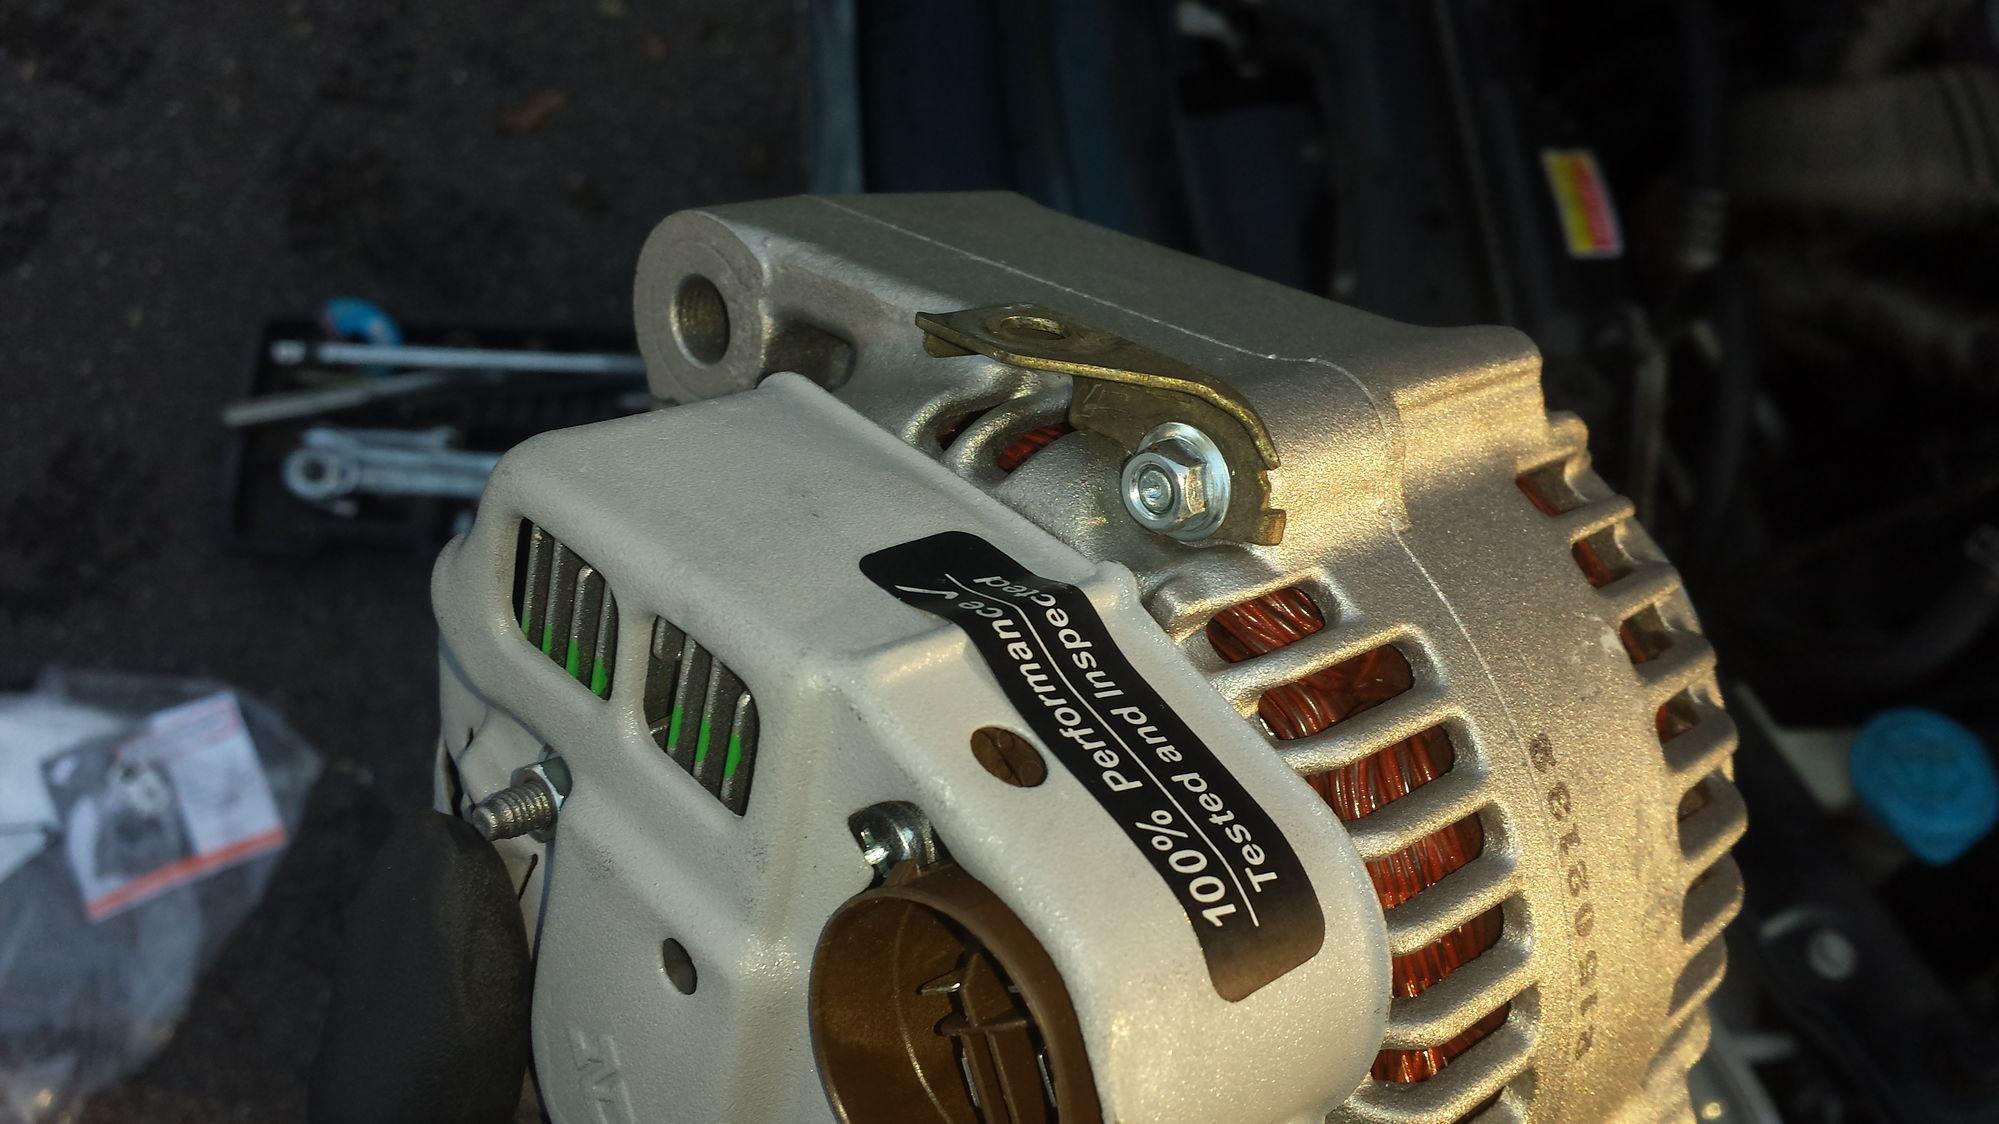 B D F Dd A D C A B F E as well C Fdd additionally Wiring besides Maxresdefault moreover Medium. on honda civic alternator wire harness